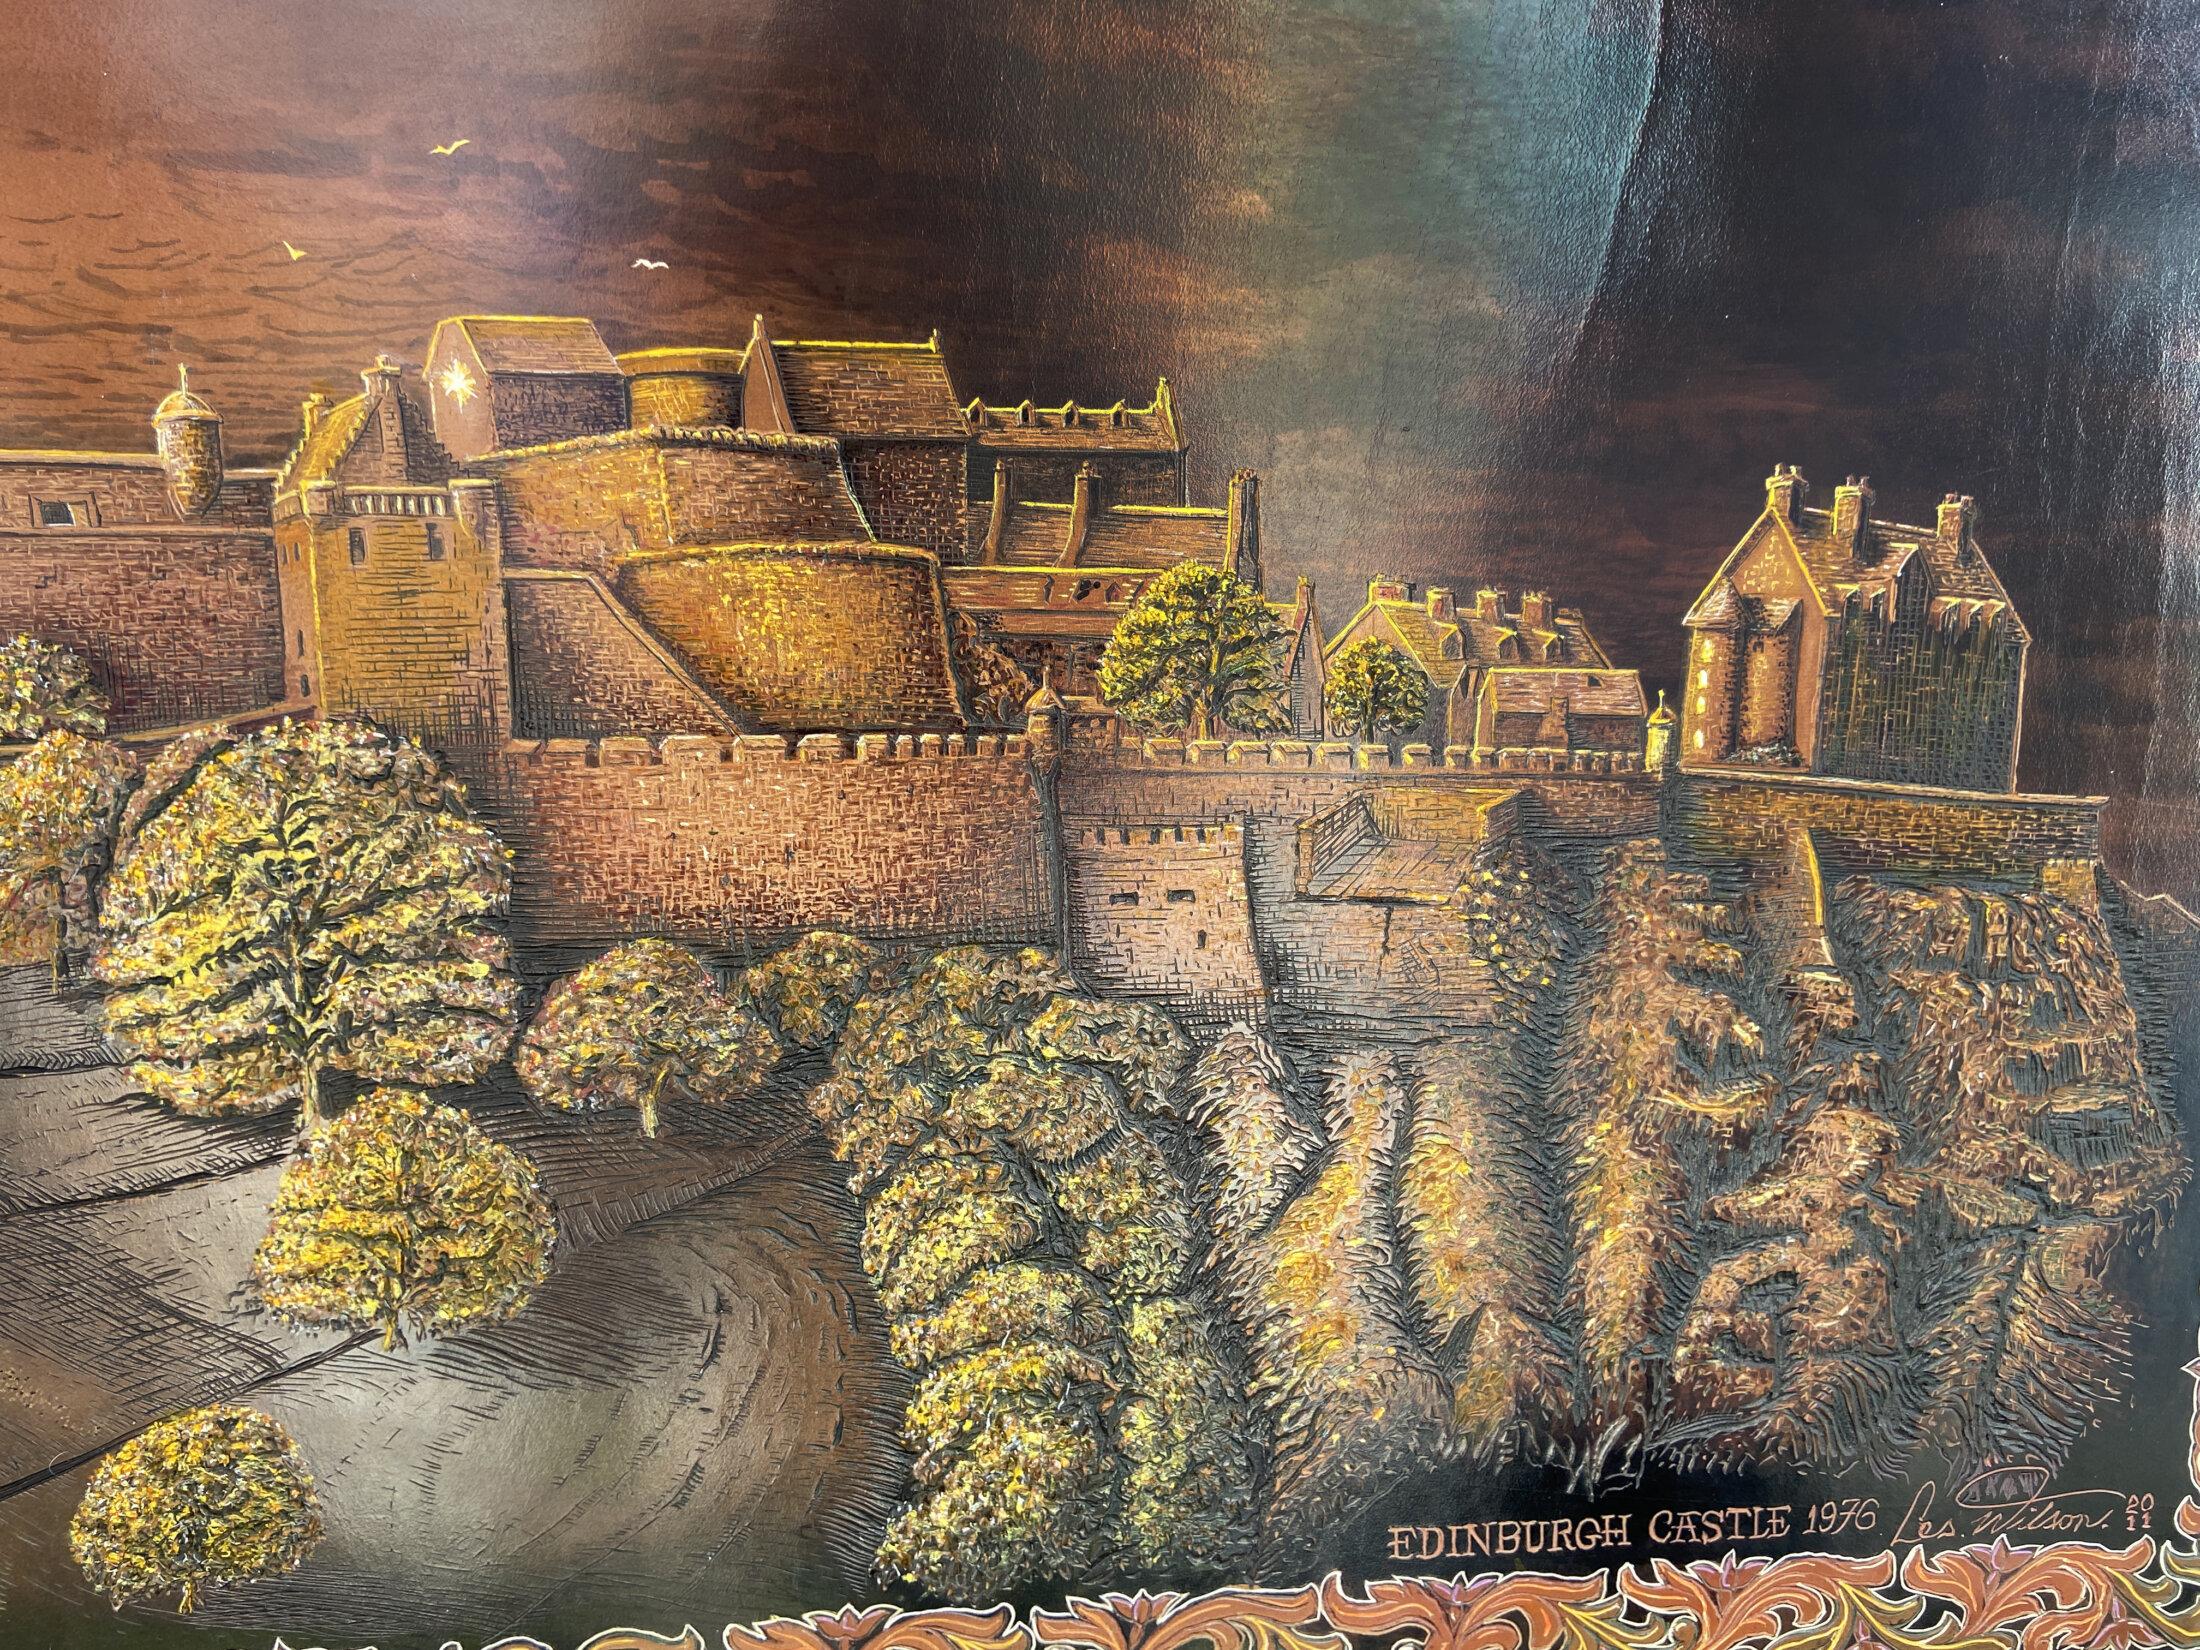 Les Wilson - Edinburgh Castle (extract)